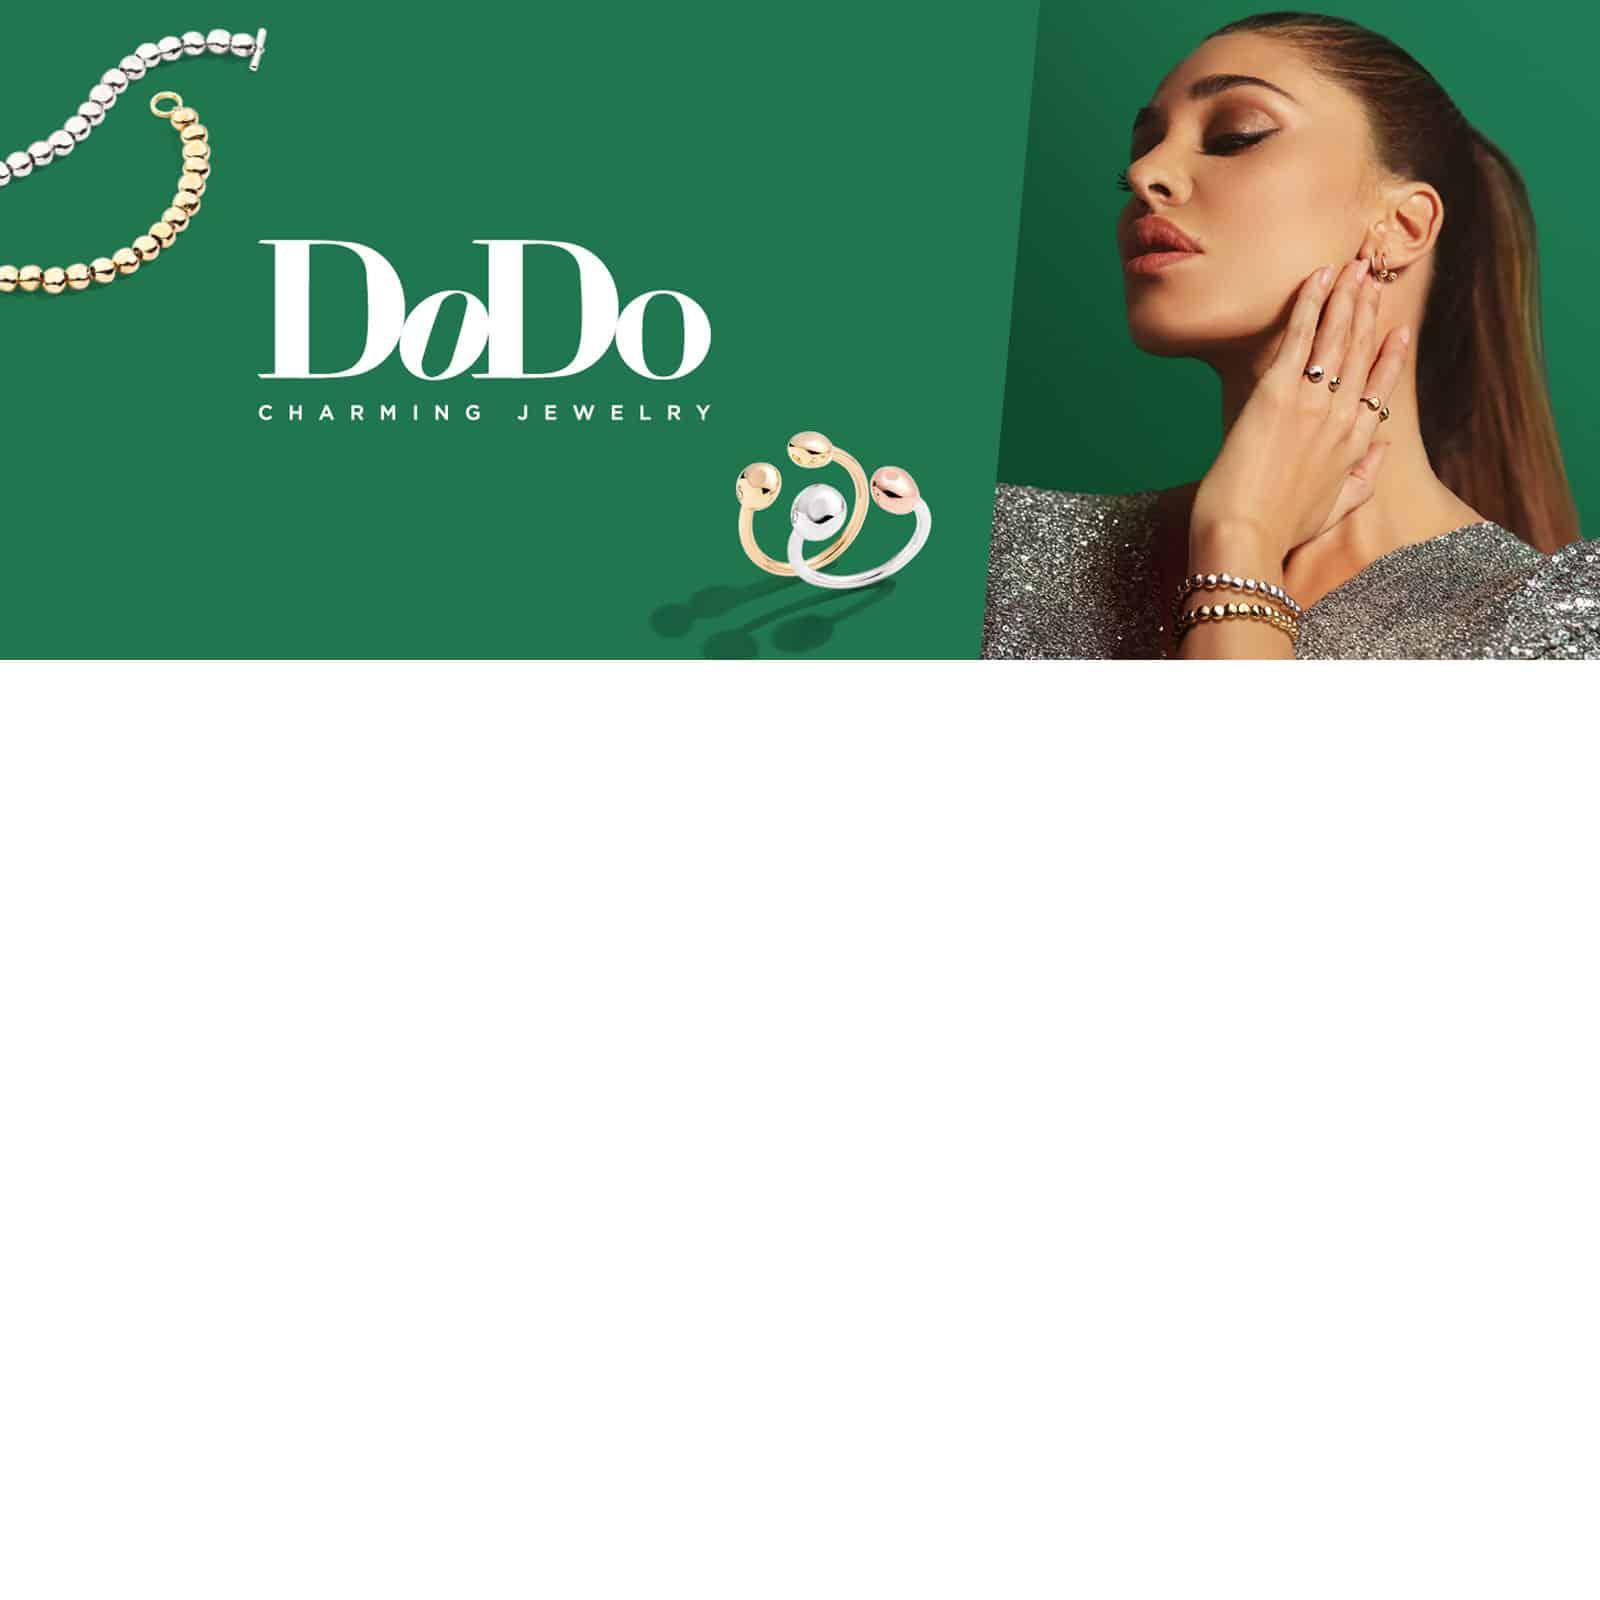 dodo-bannière-horlogerie-joaillerie-vevey.jpg